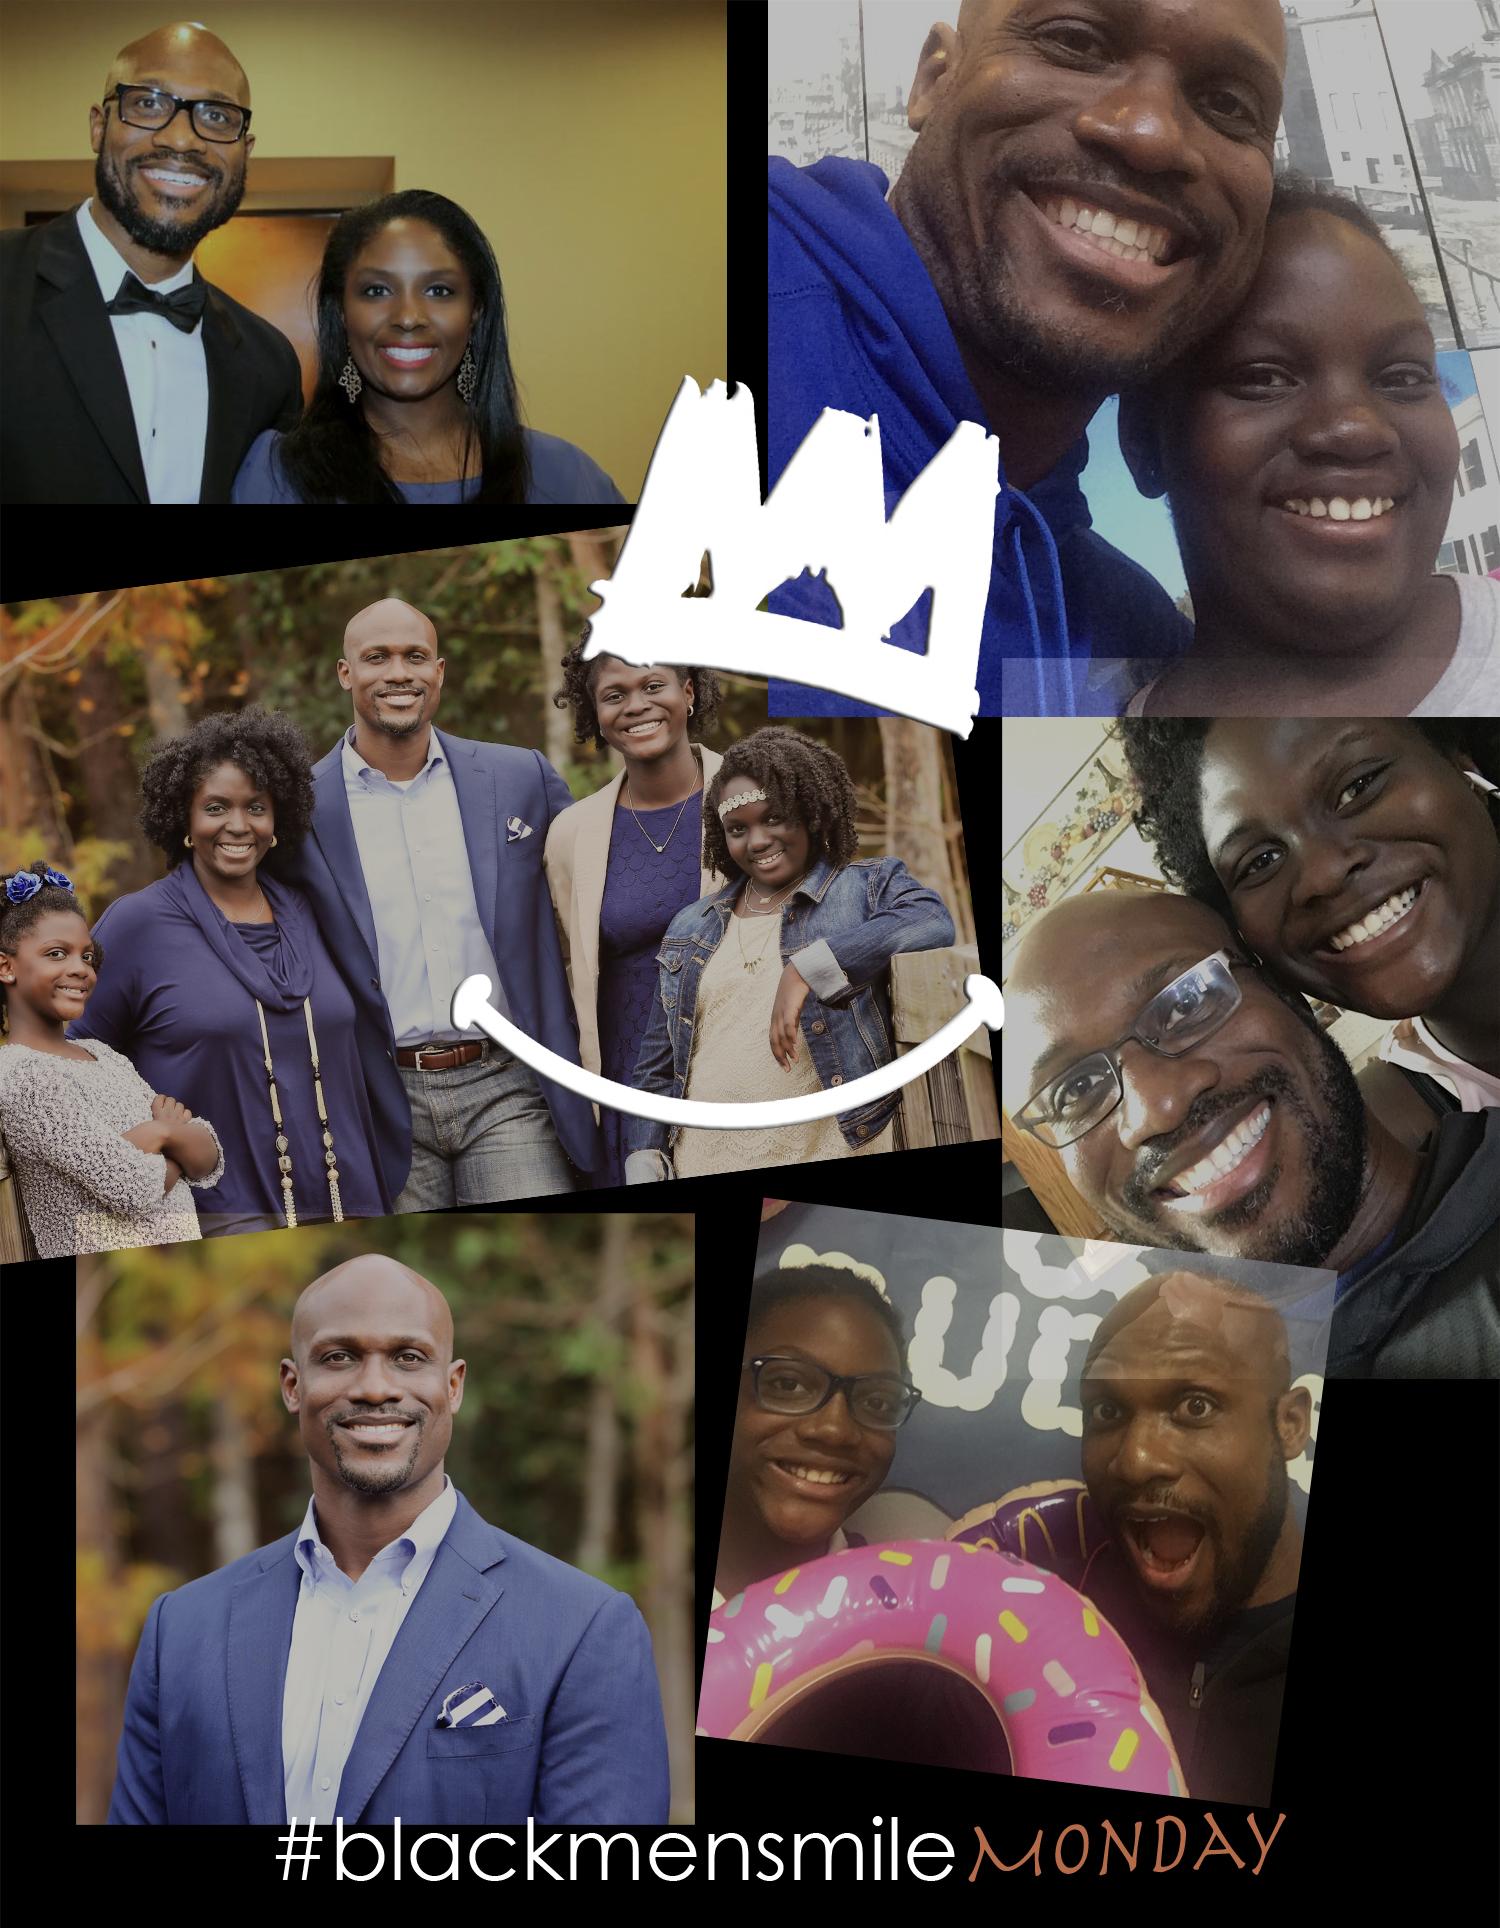 black-men-smile-monday-robert-selders.jpg